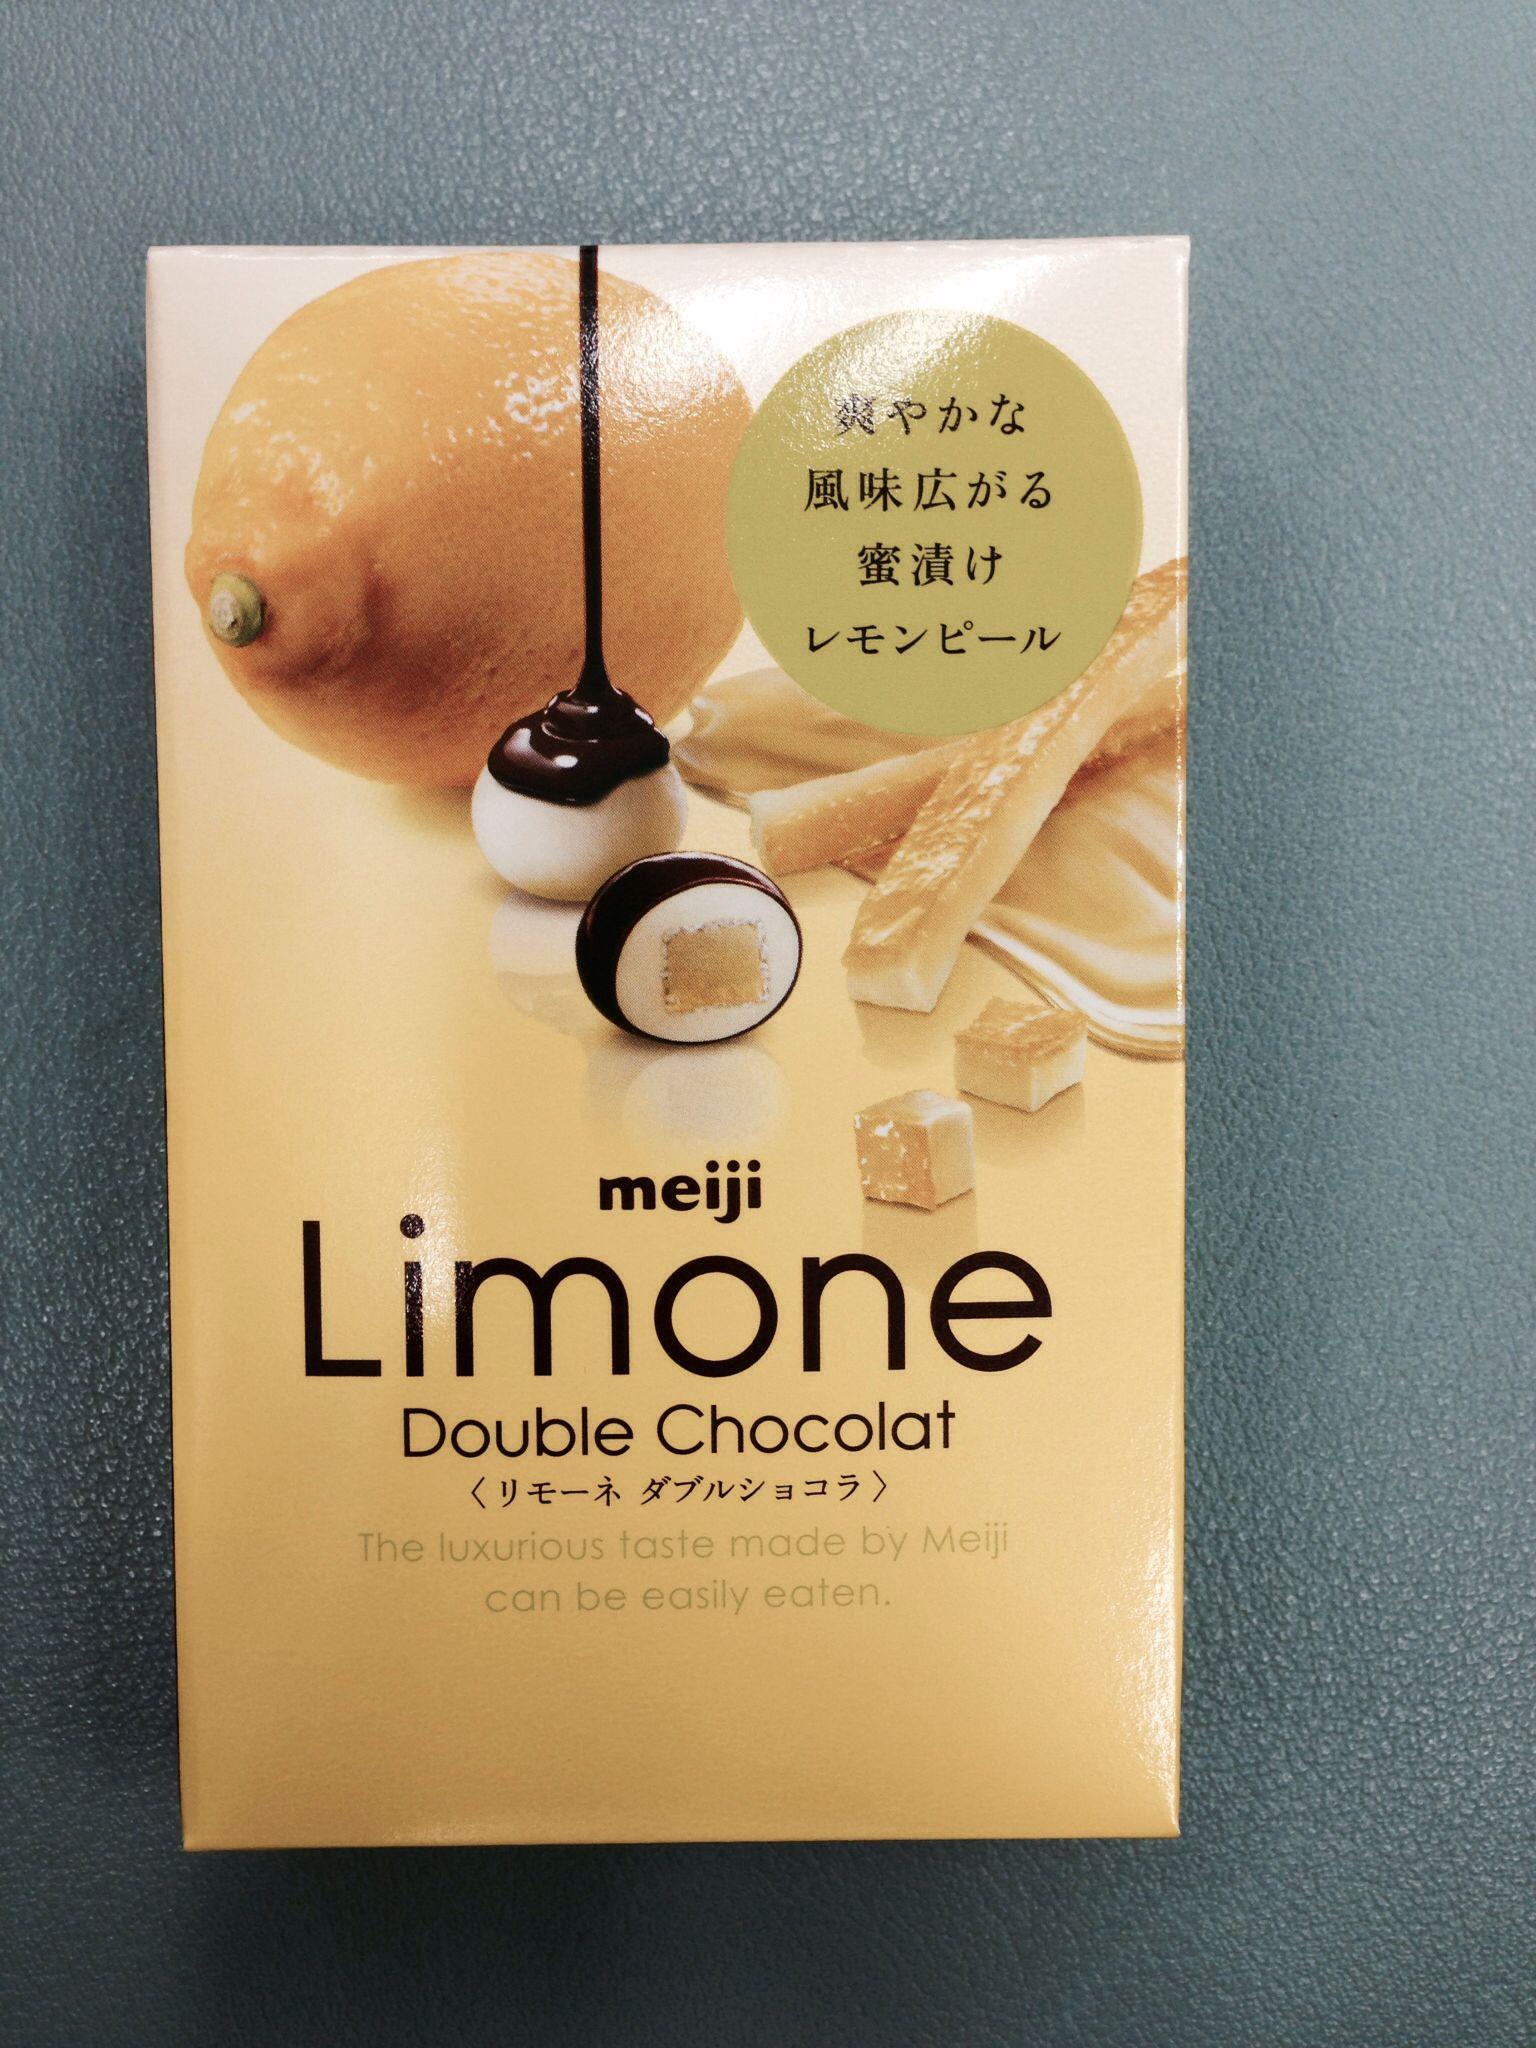 Limone Chocolate